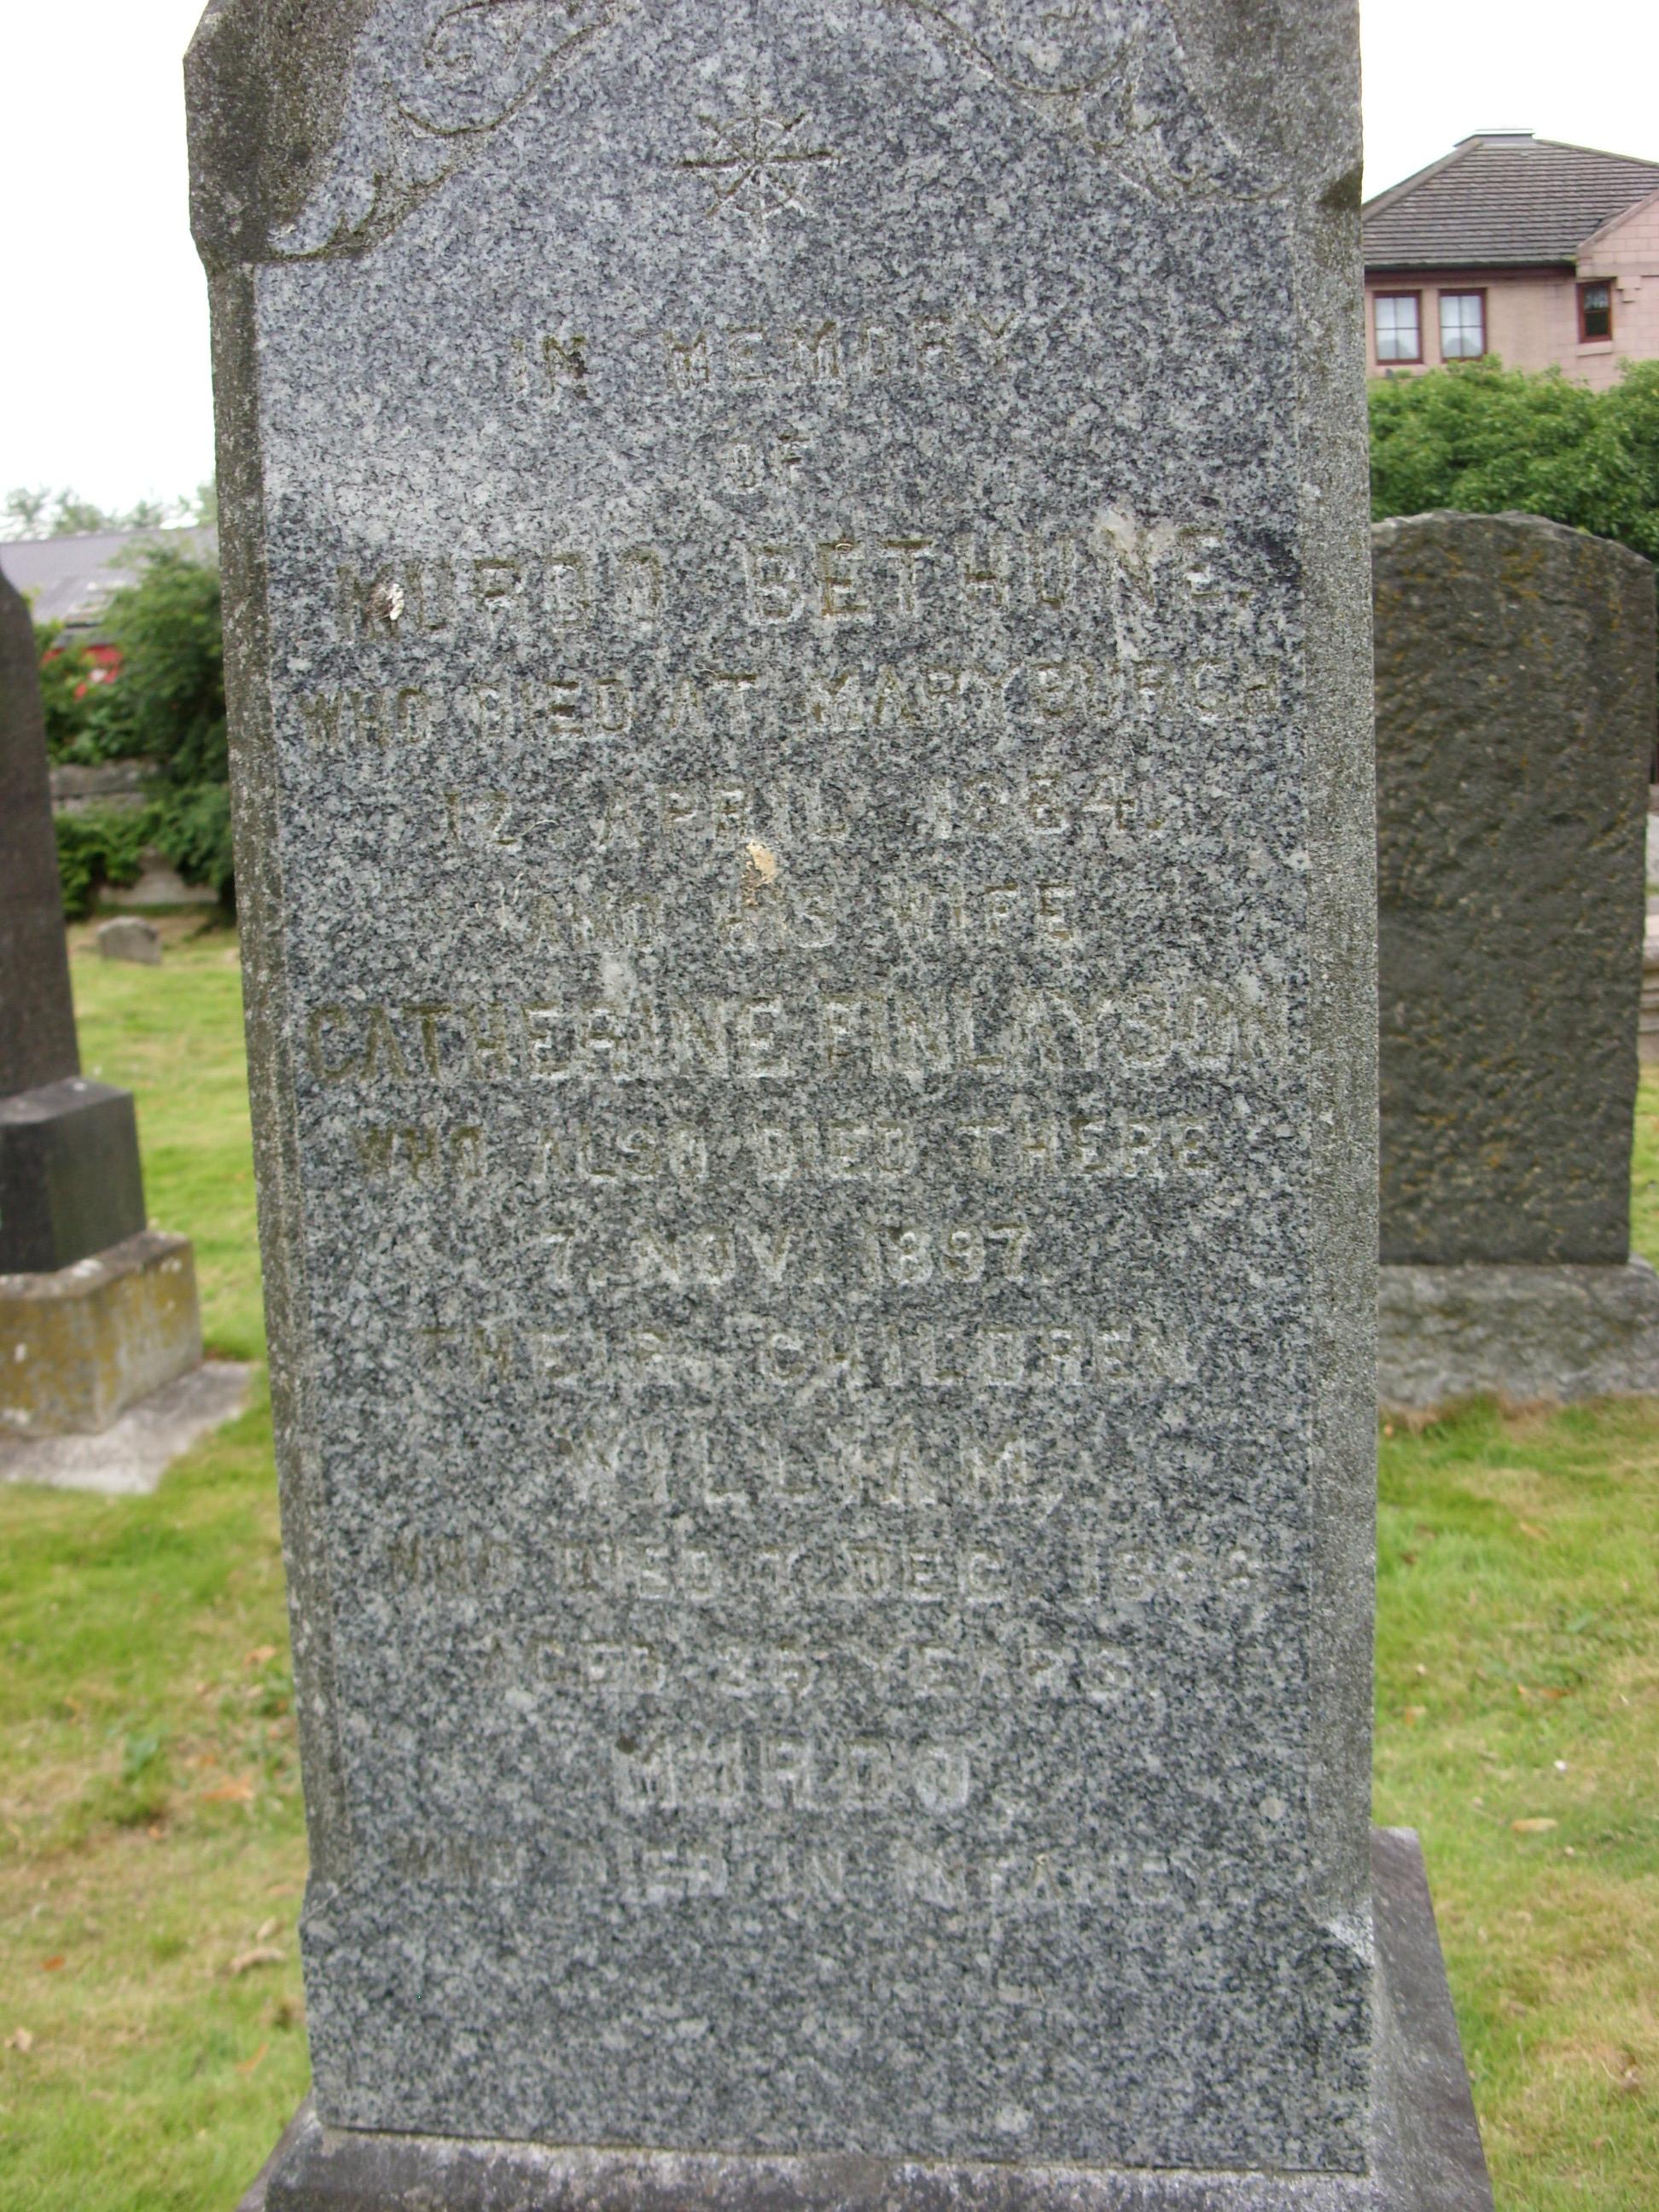 St Clements Churchyard Dingwall Ross Shire